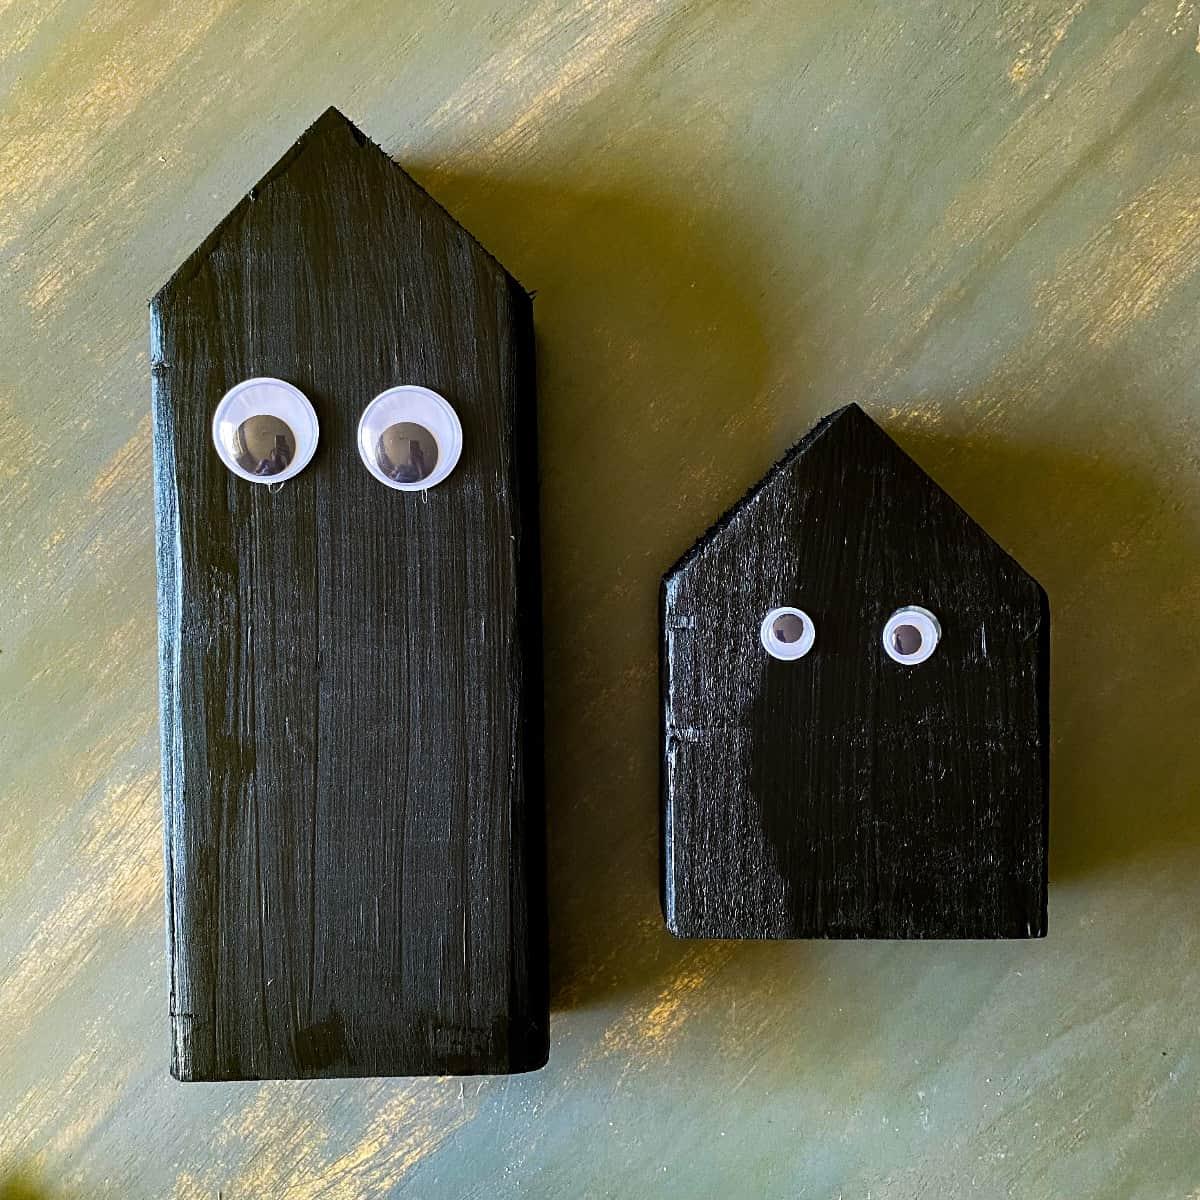 Adding googly eyes to halloween black cat wood block decor.